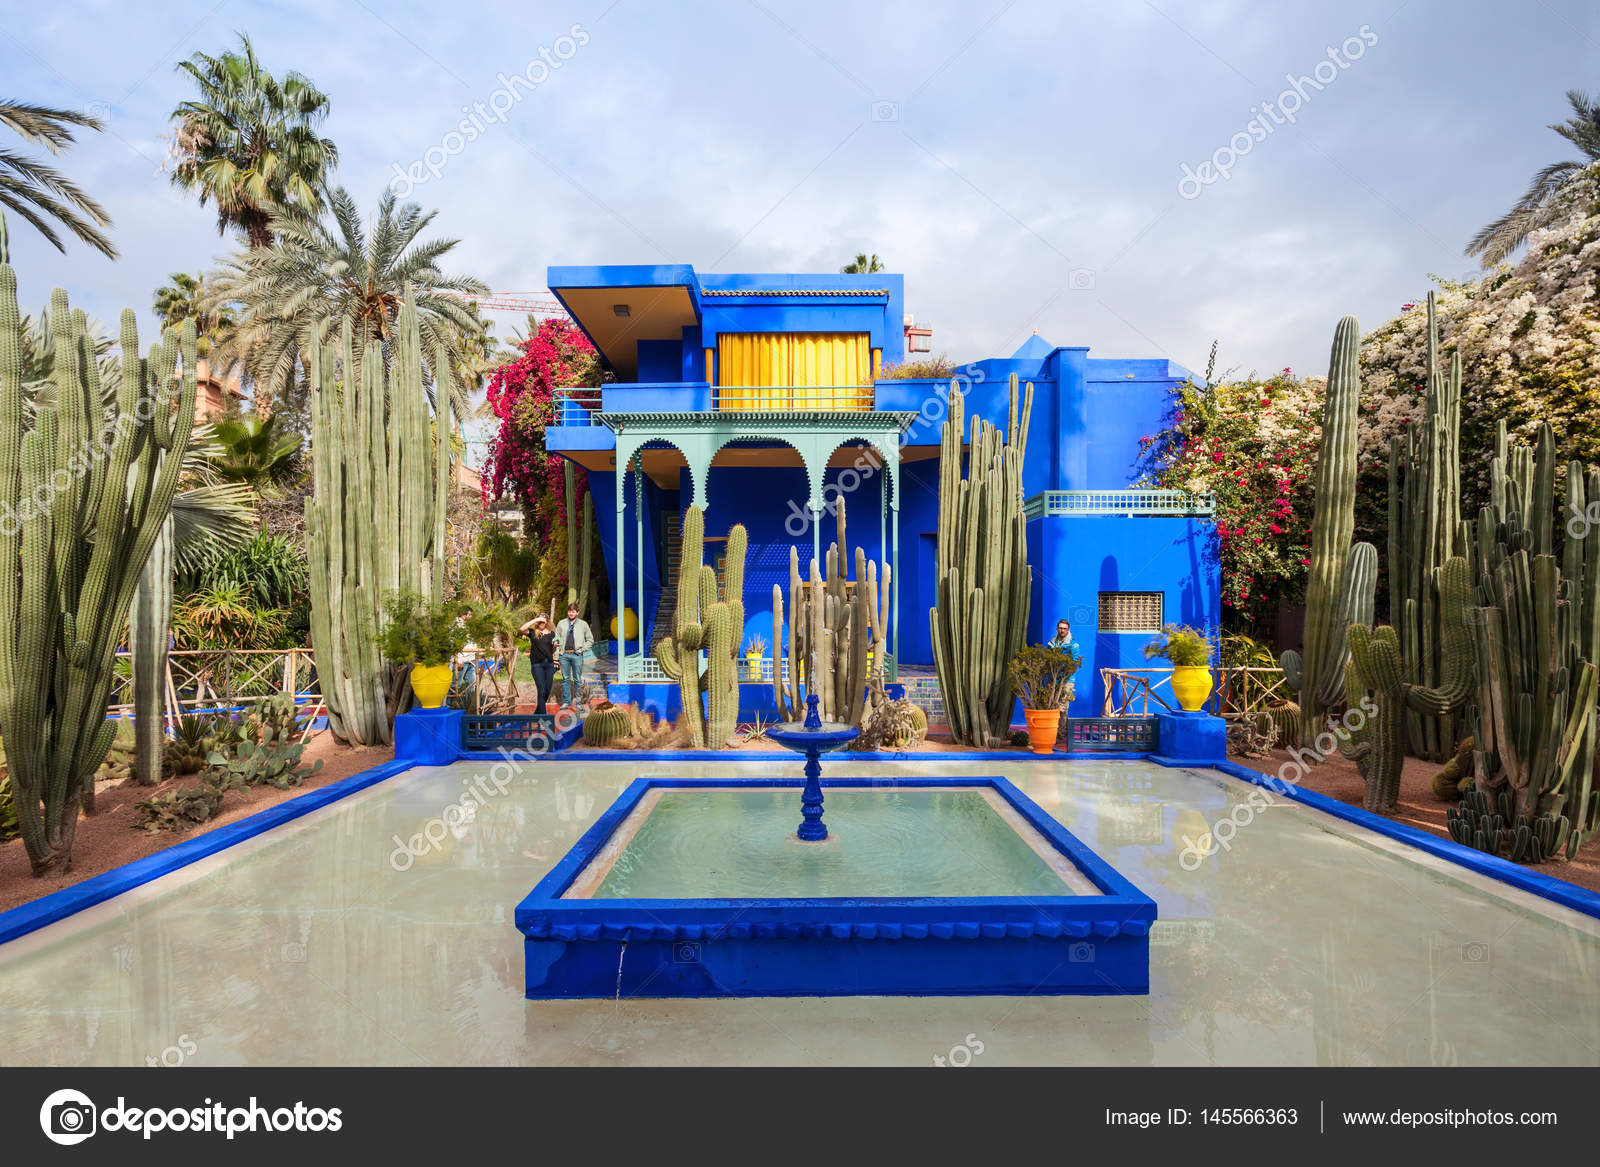 Le jardin majorelle photo ditoriale saiko3p 145566363 - Jardin majorelle prix d entree ...